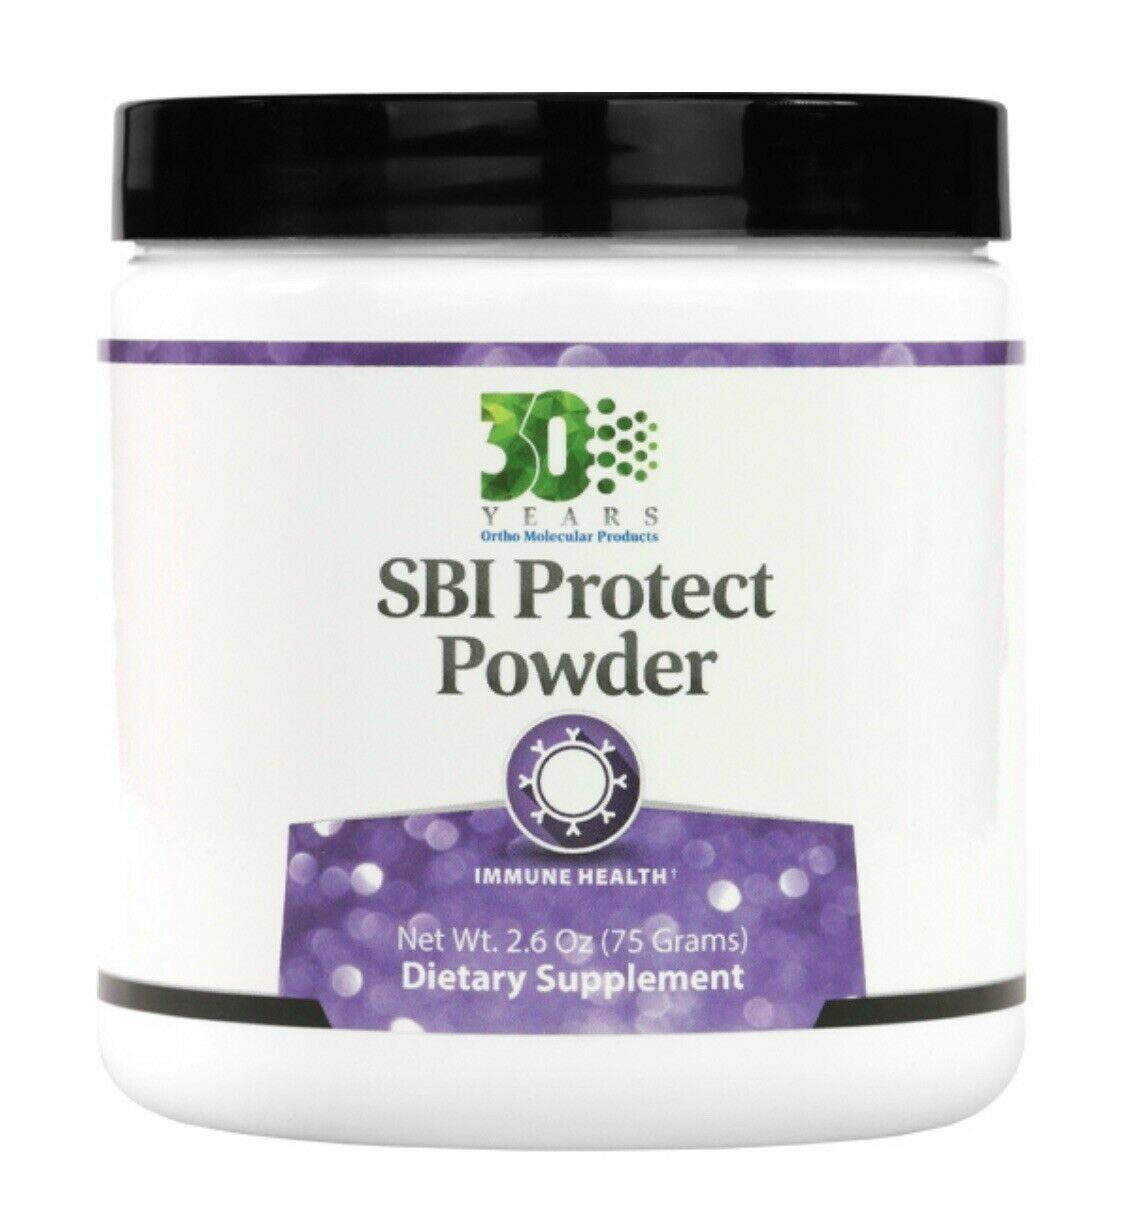 Ortho Molecular SBI Protect Powder 2.6oz Exp. 11/20 - FREE SHIPPING - NEW